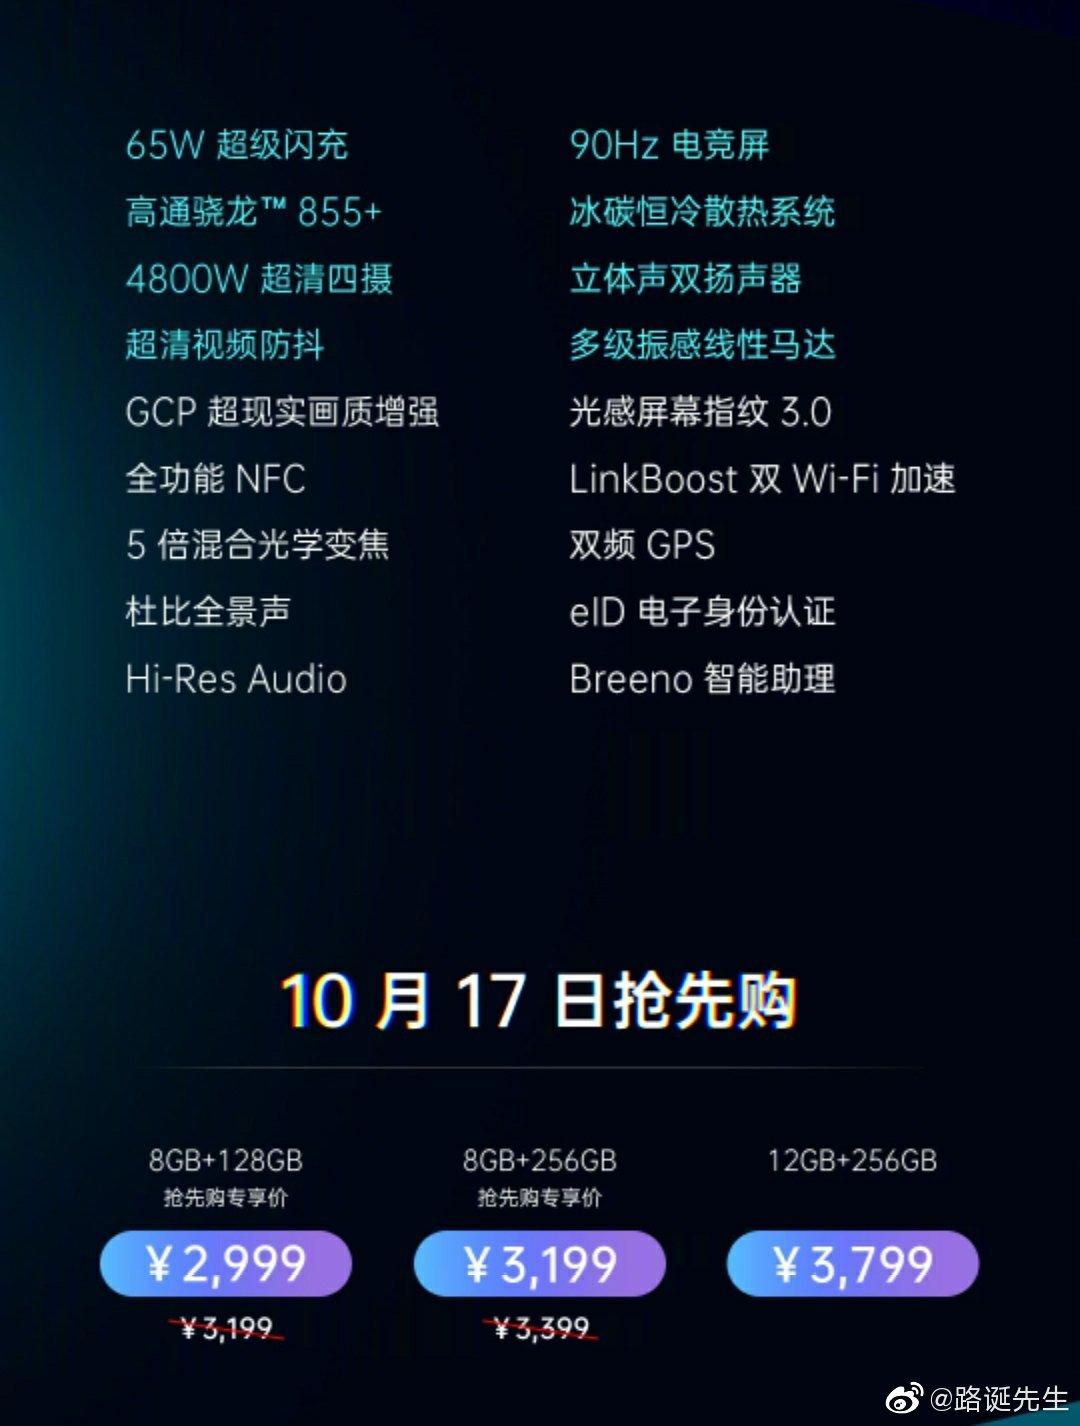 这几天发布的三个旗舰:OPPO Reno Ace、realme X2 Pro、一加7T